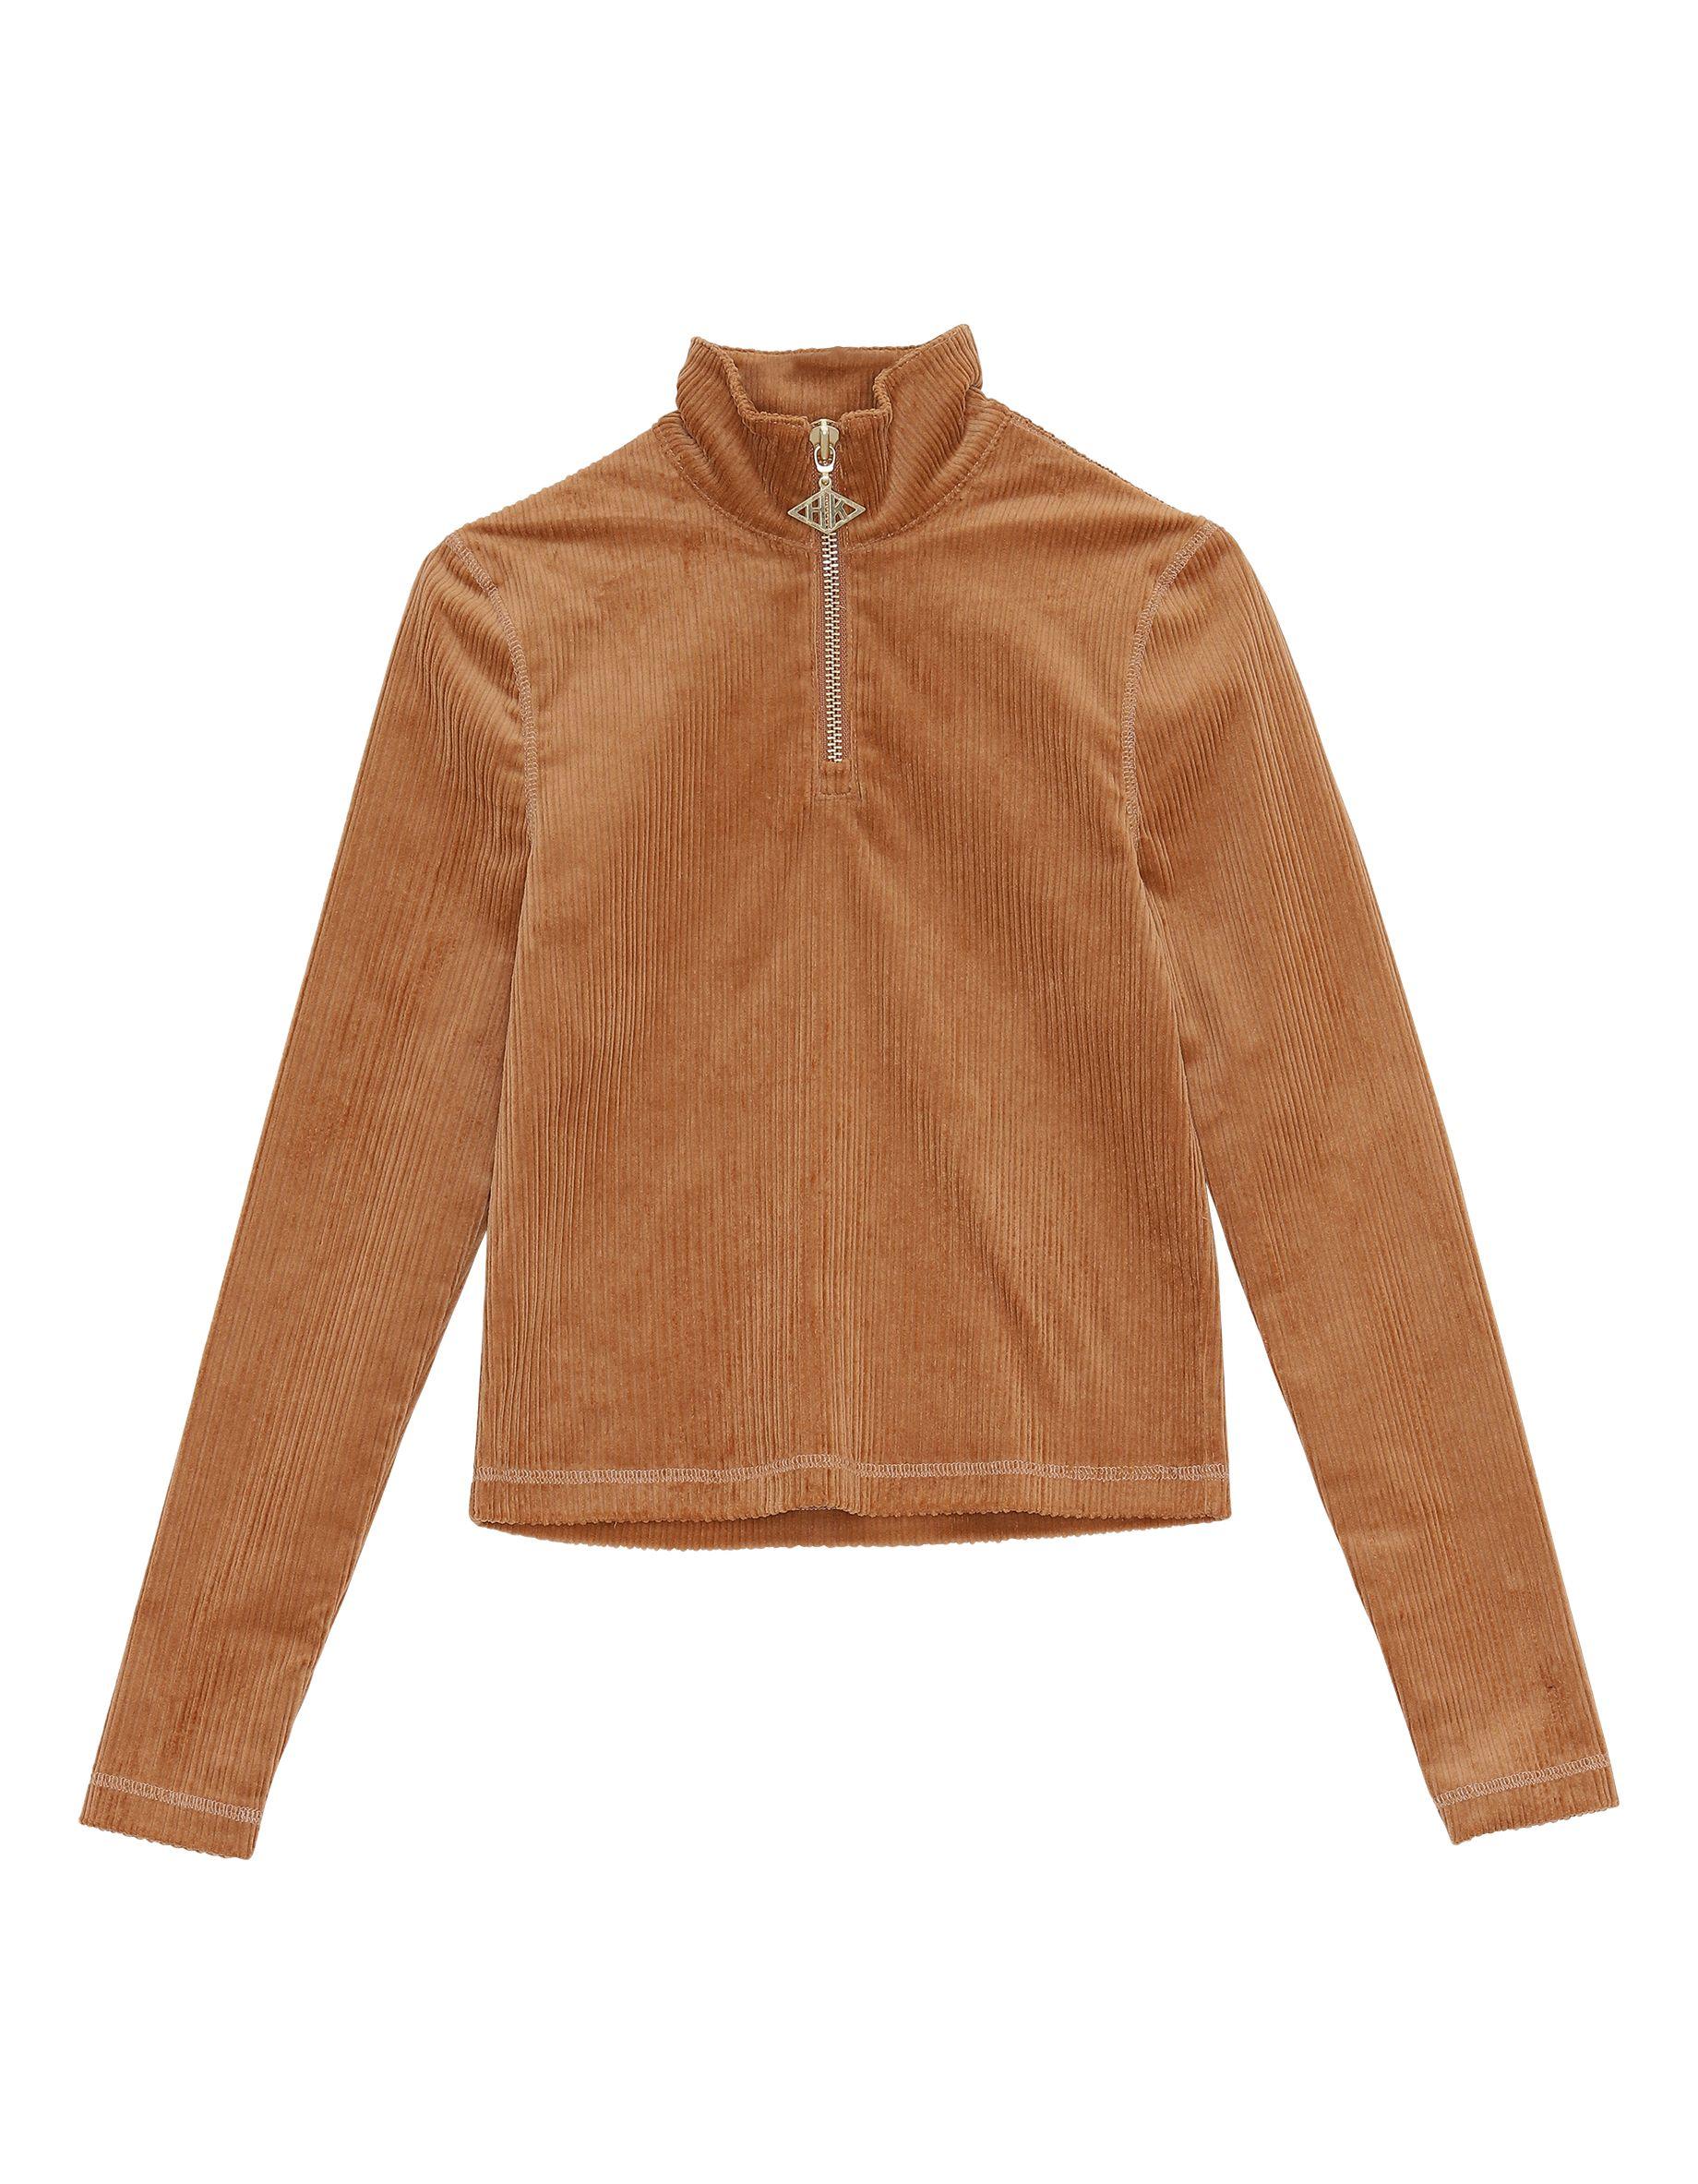 half zip long sleeve jersey corduroy